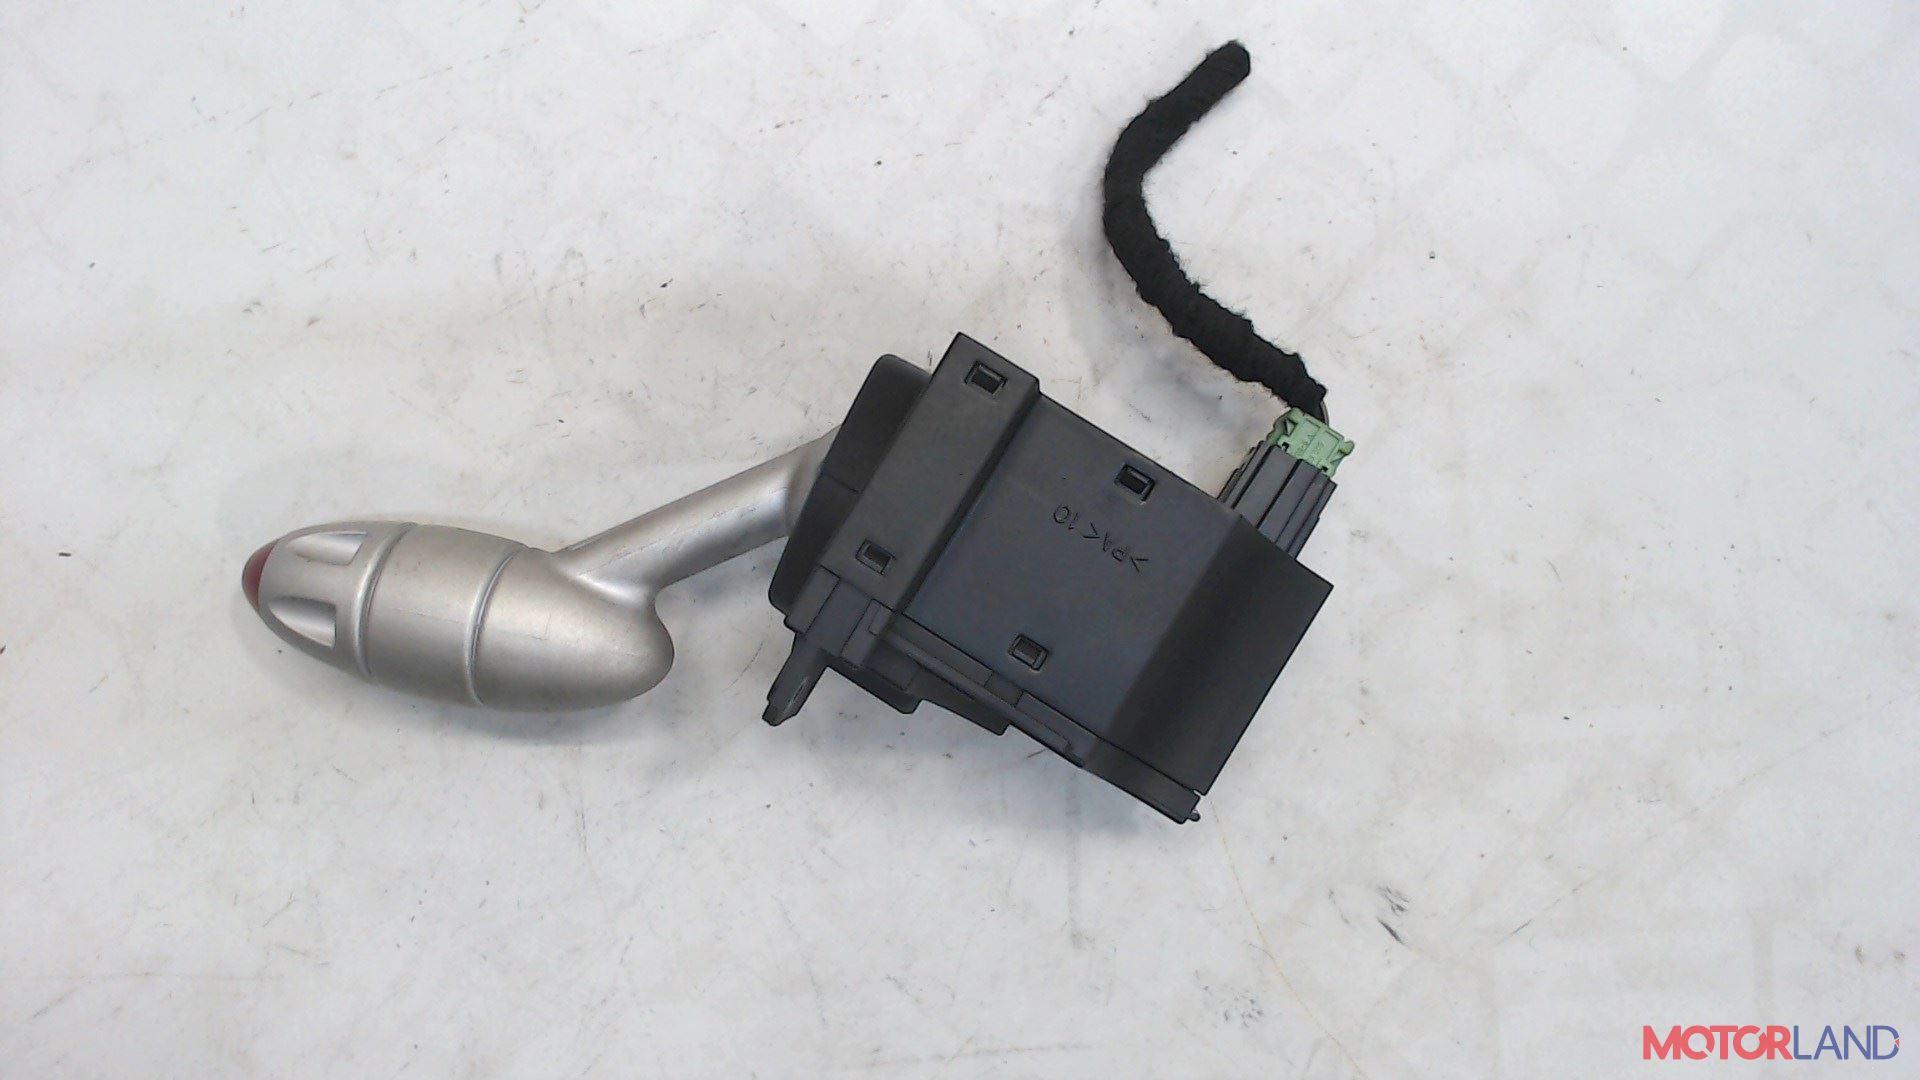 Переключатель дворников (стеклоочистителя) Mini Cooper 2001-2010, Артикул 5700355 #1